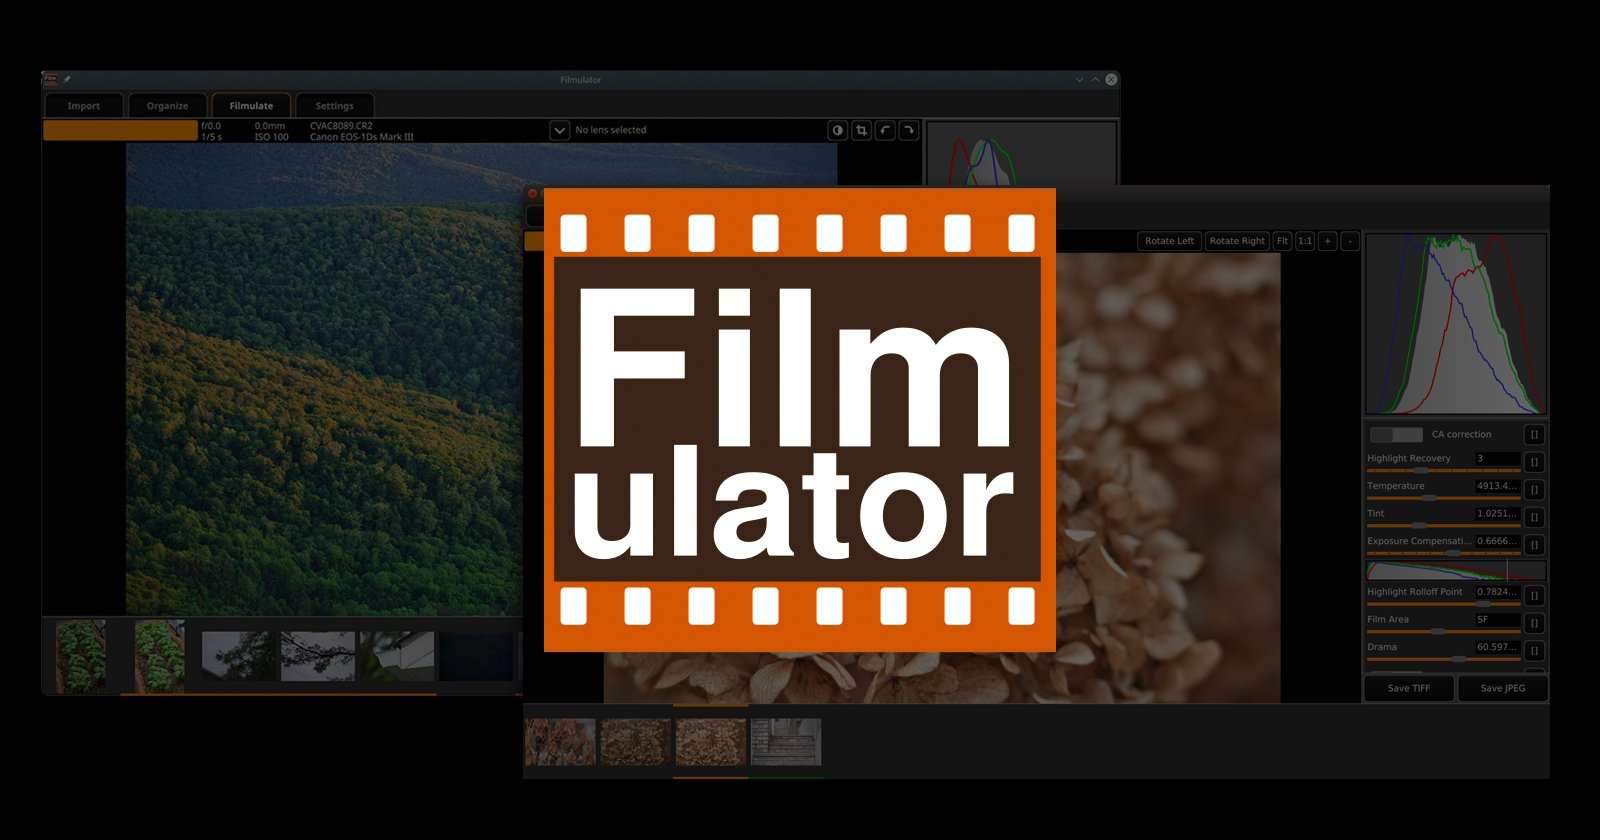 Filmulator is an Open-Source RAW Editor Based on Film Development